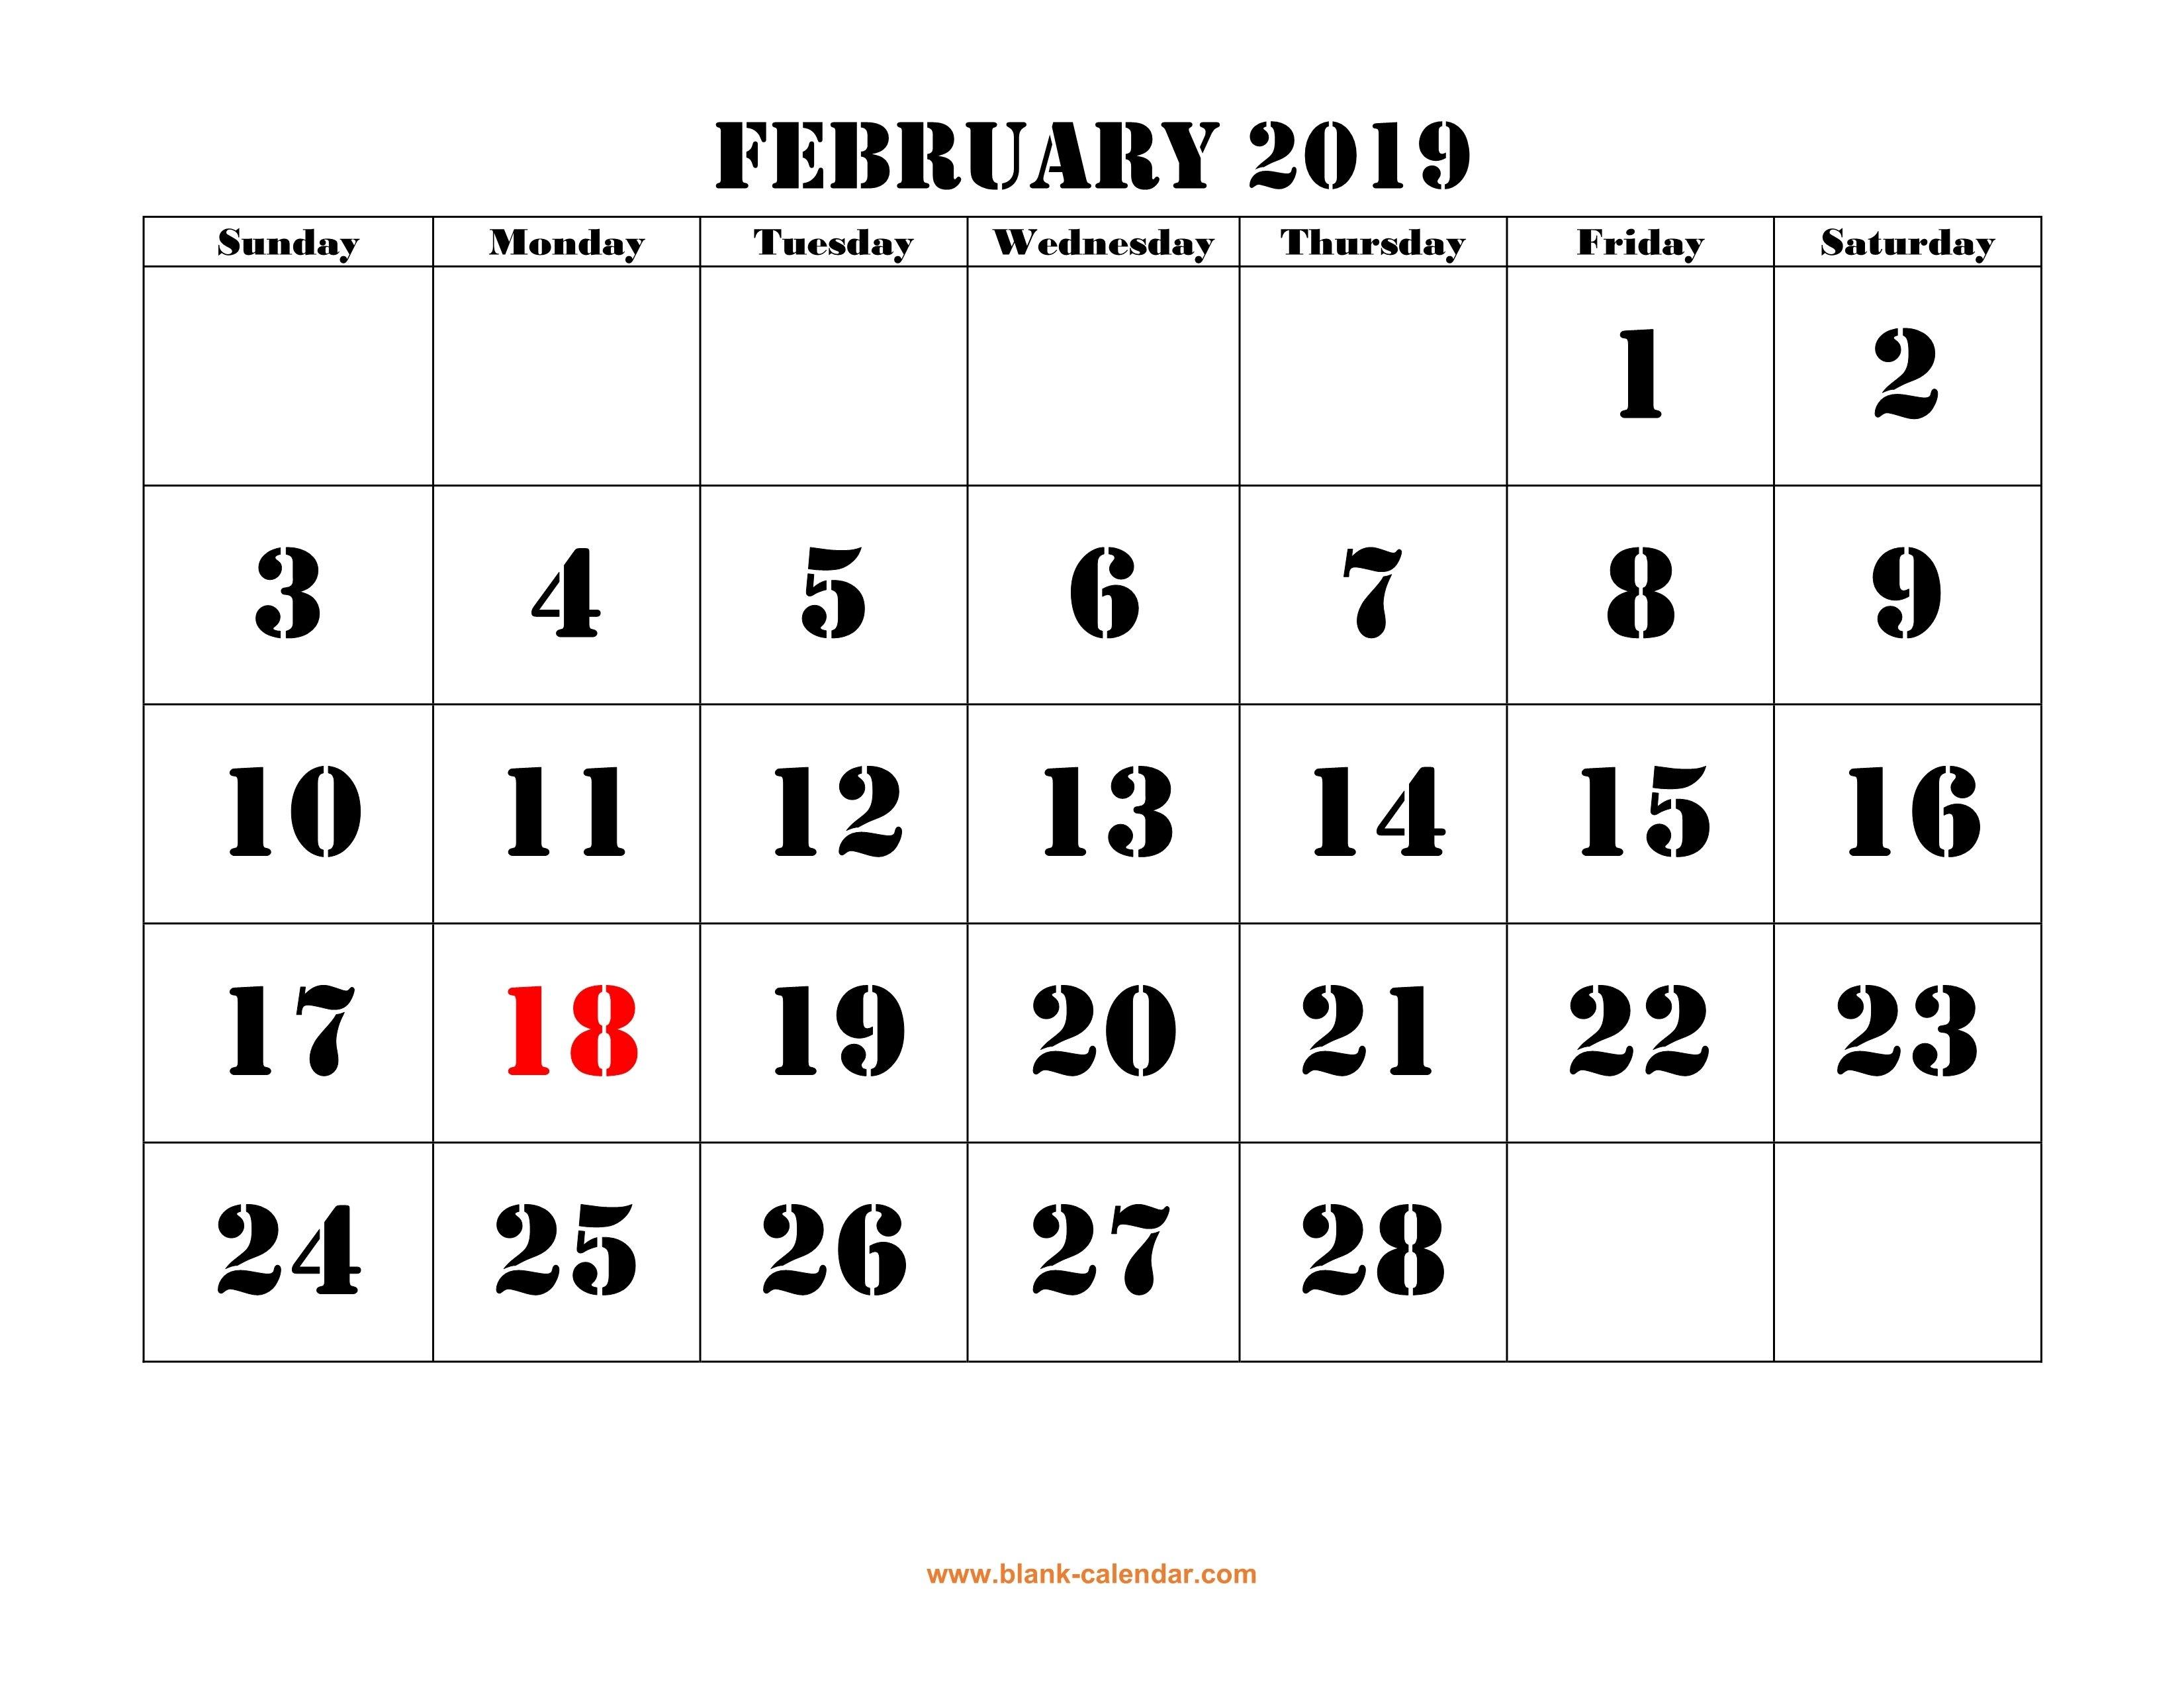 Free Download Printable February 2019 Calendar, Large Font Design Feb 5 2019 Calendar